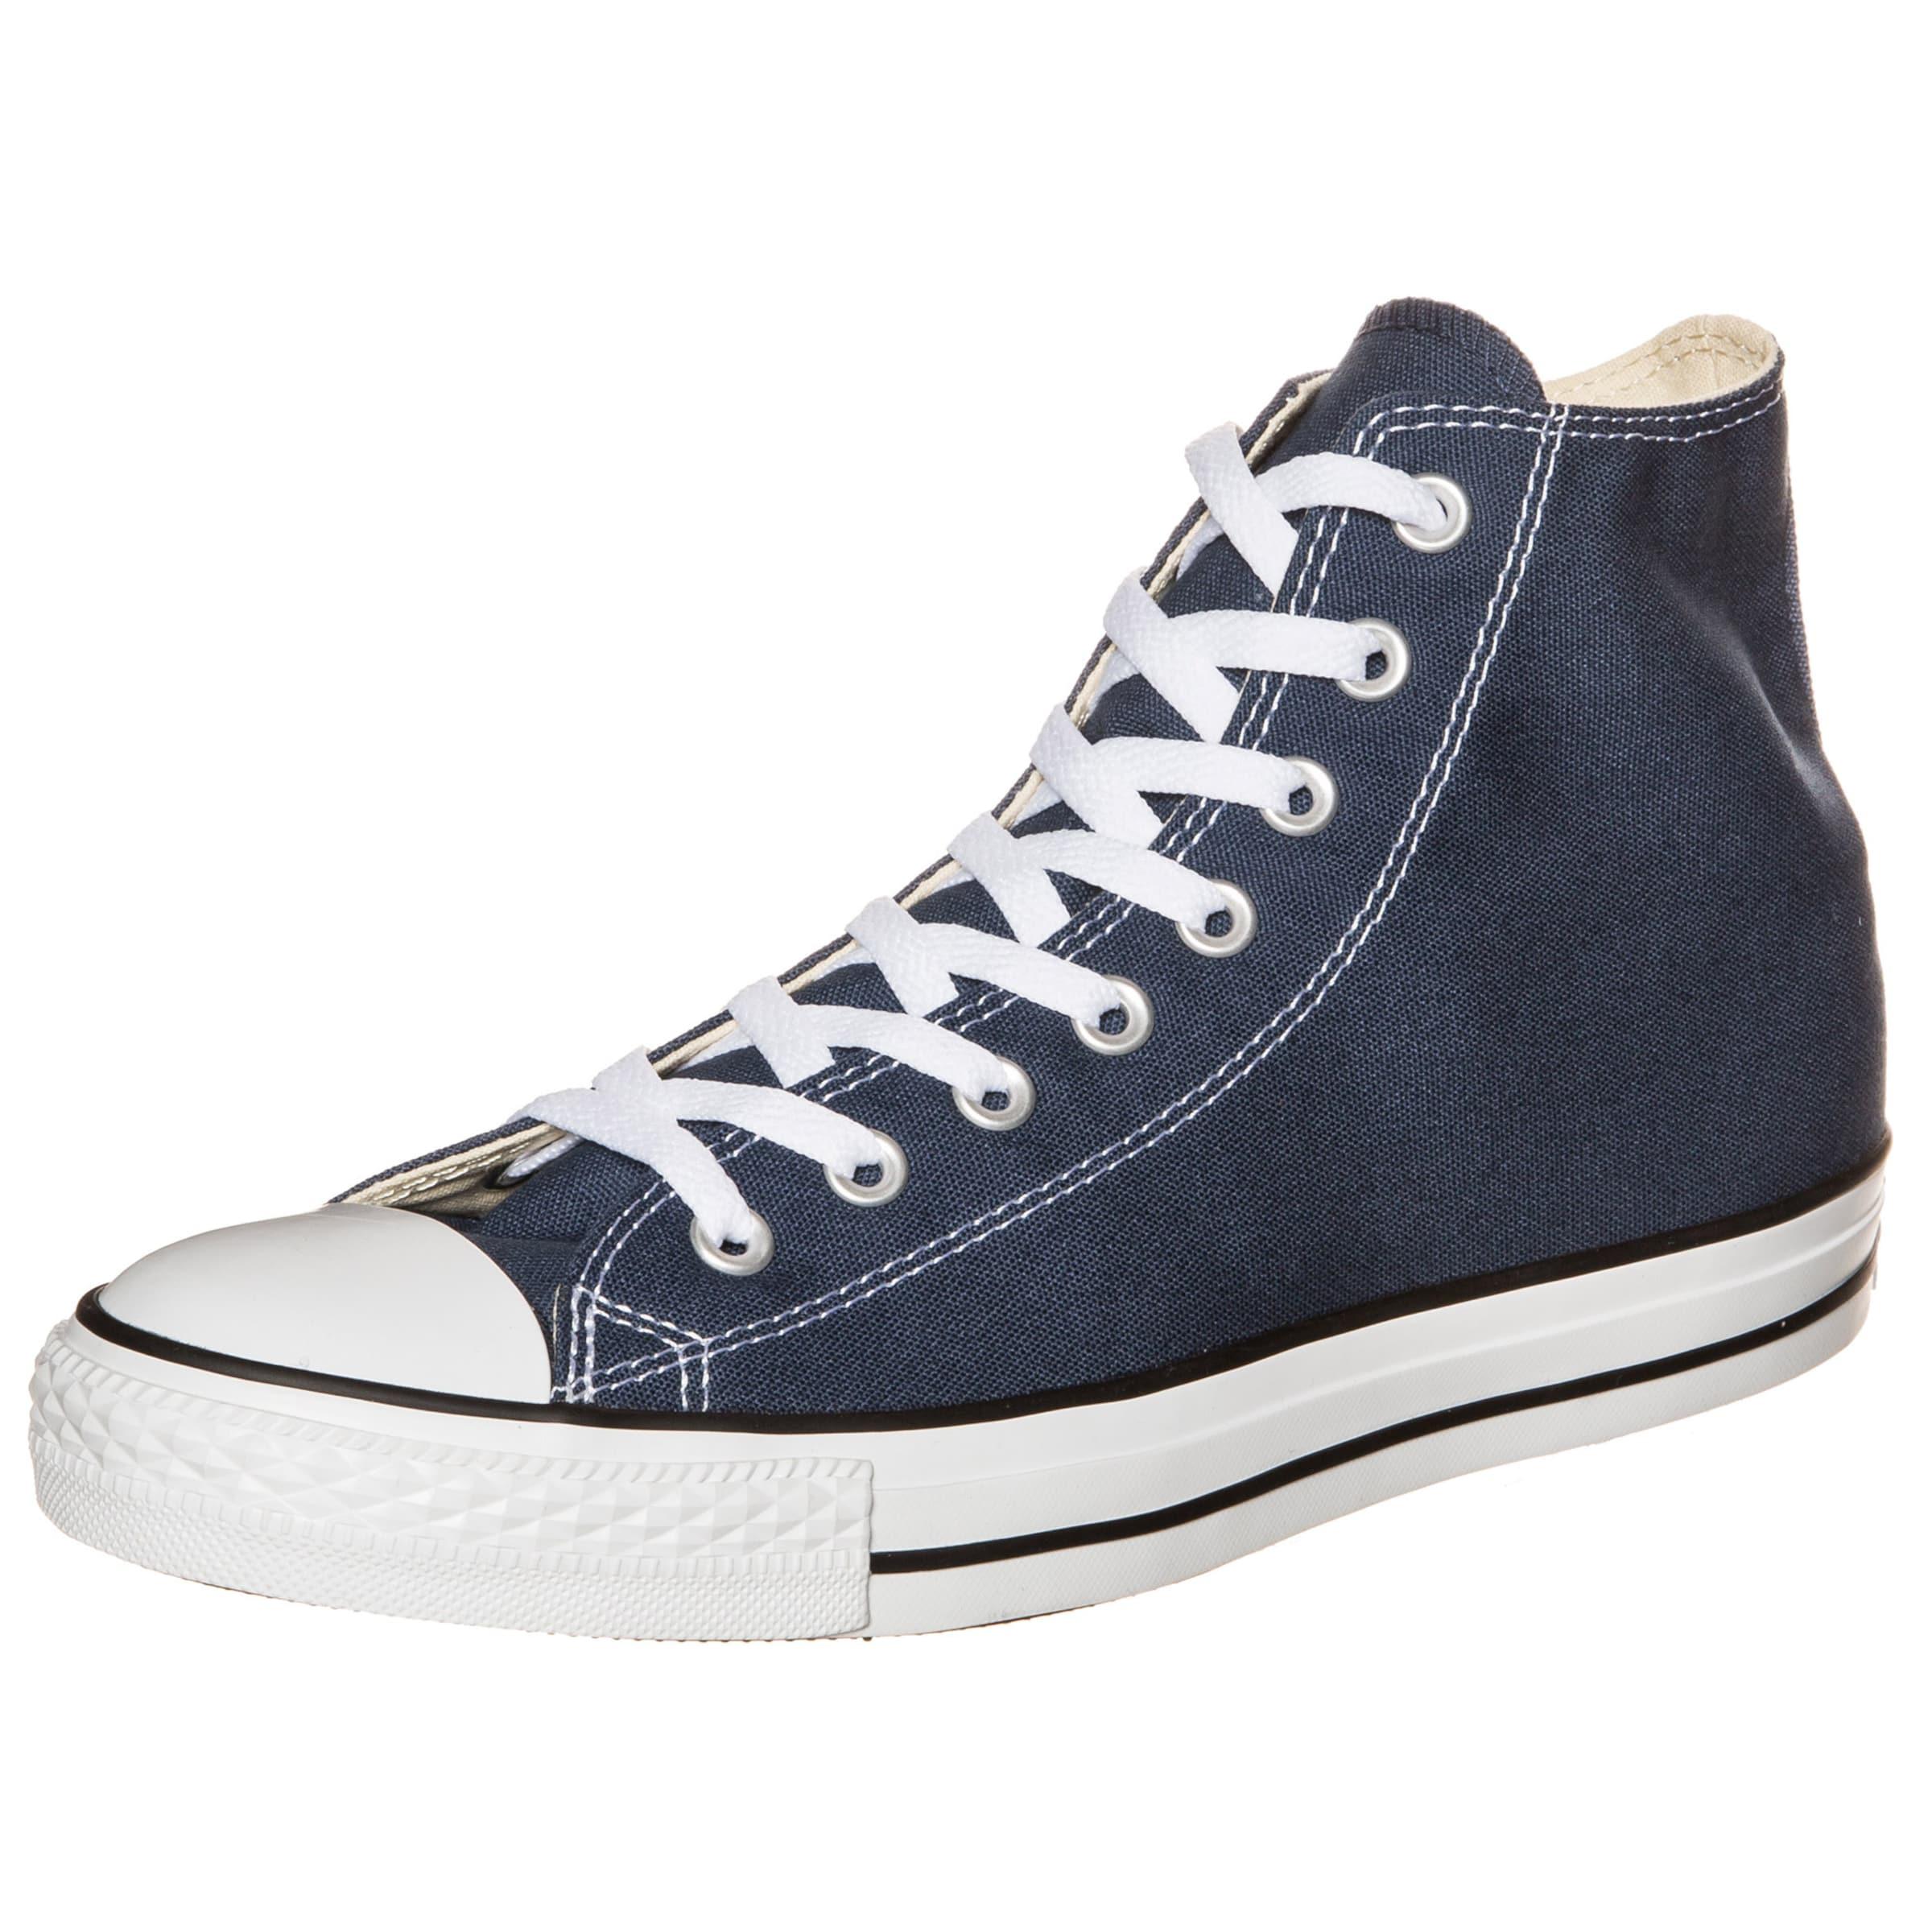 CONVERSE High Sneaker Günstige und langlebige Schuhe